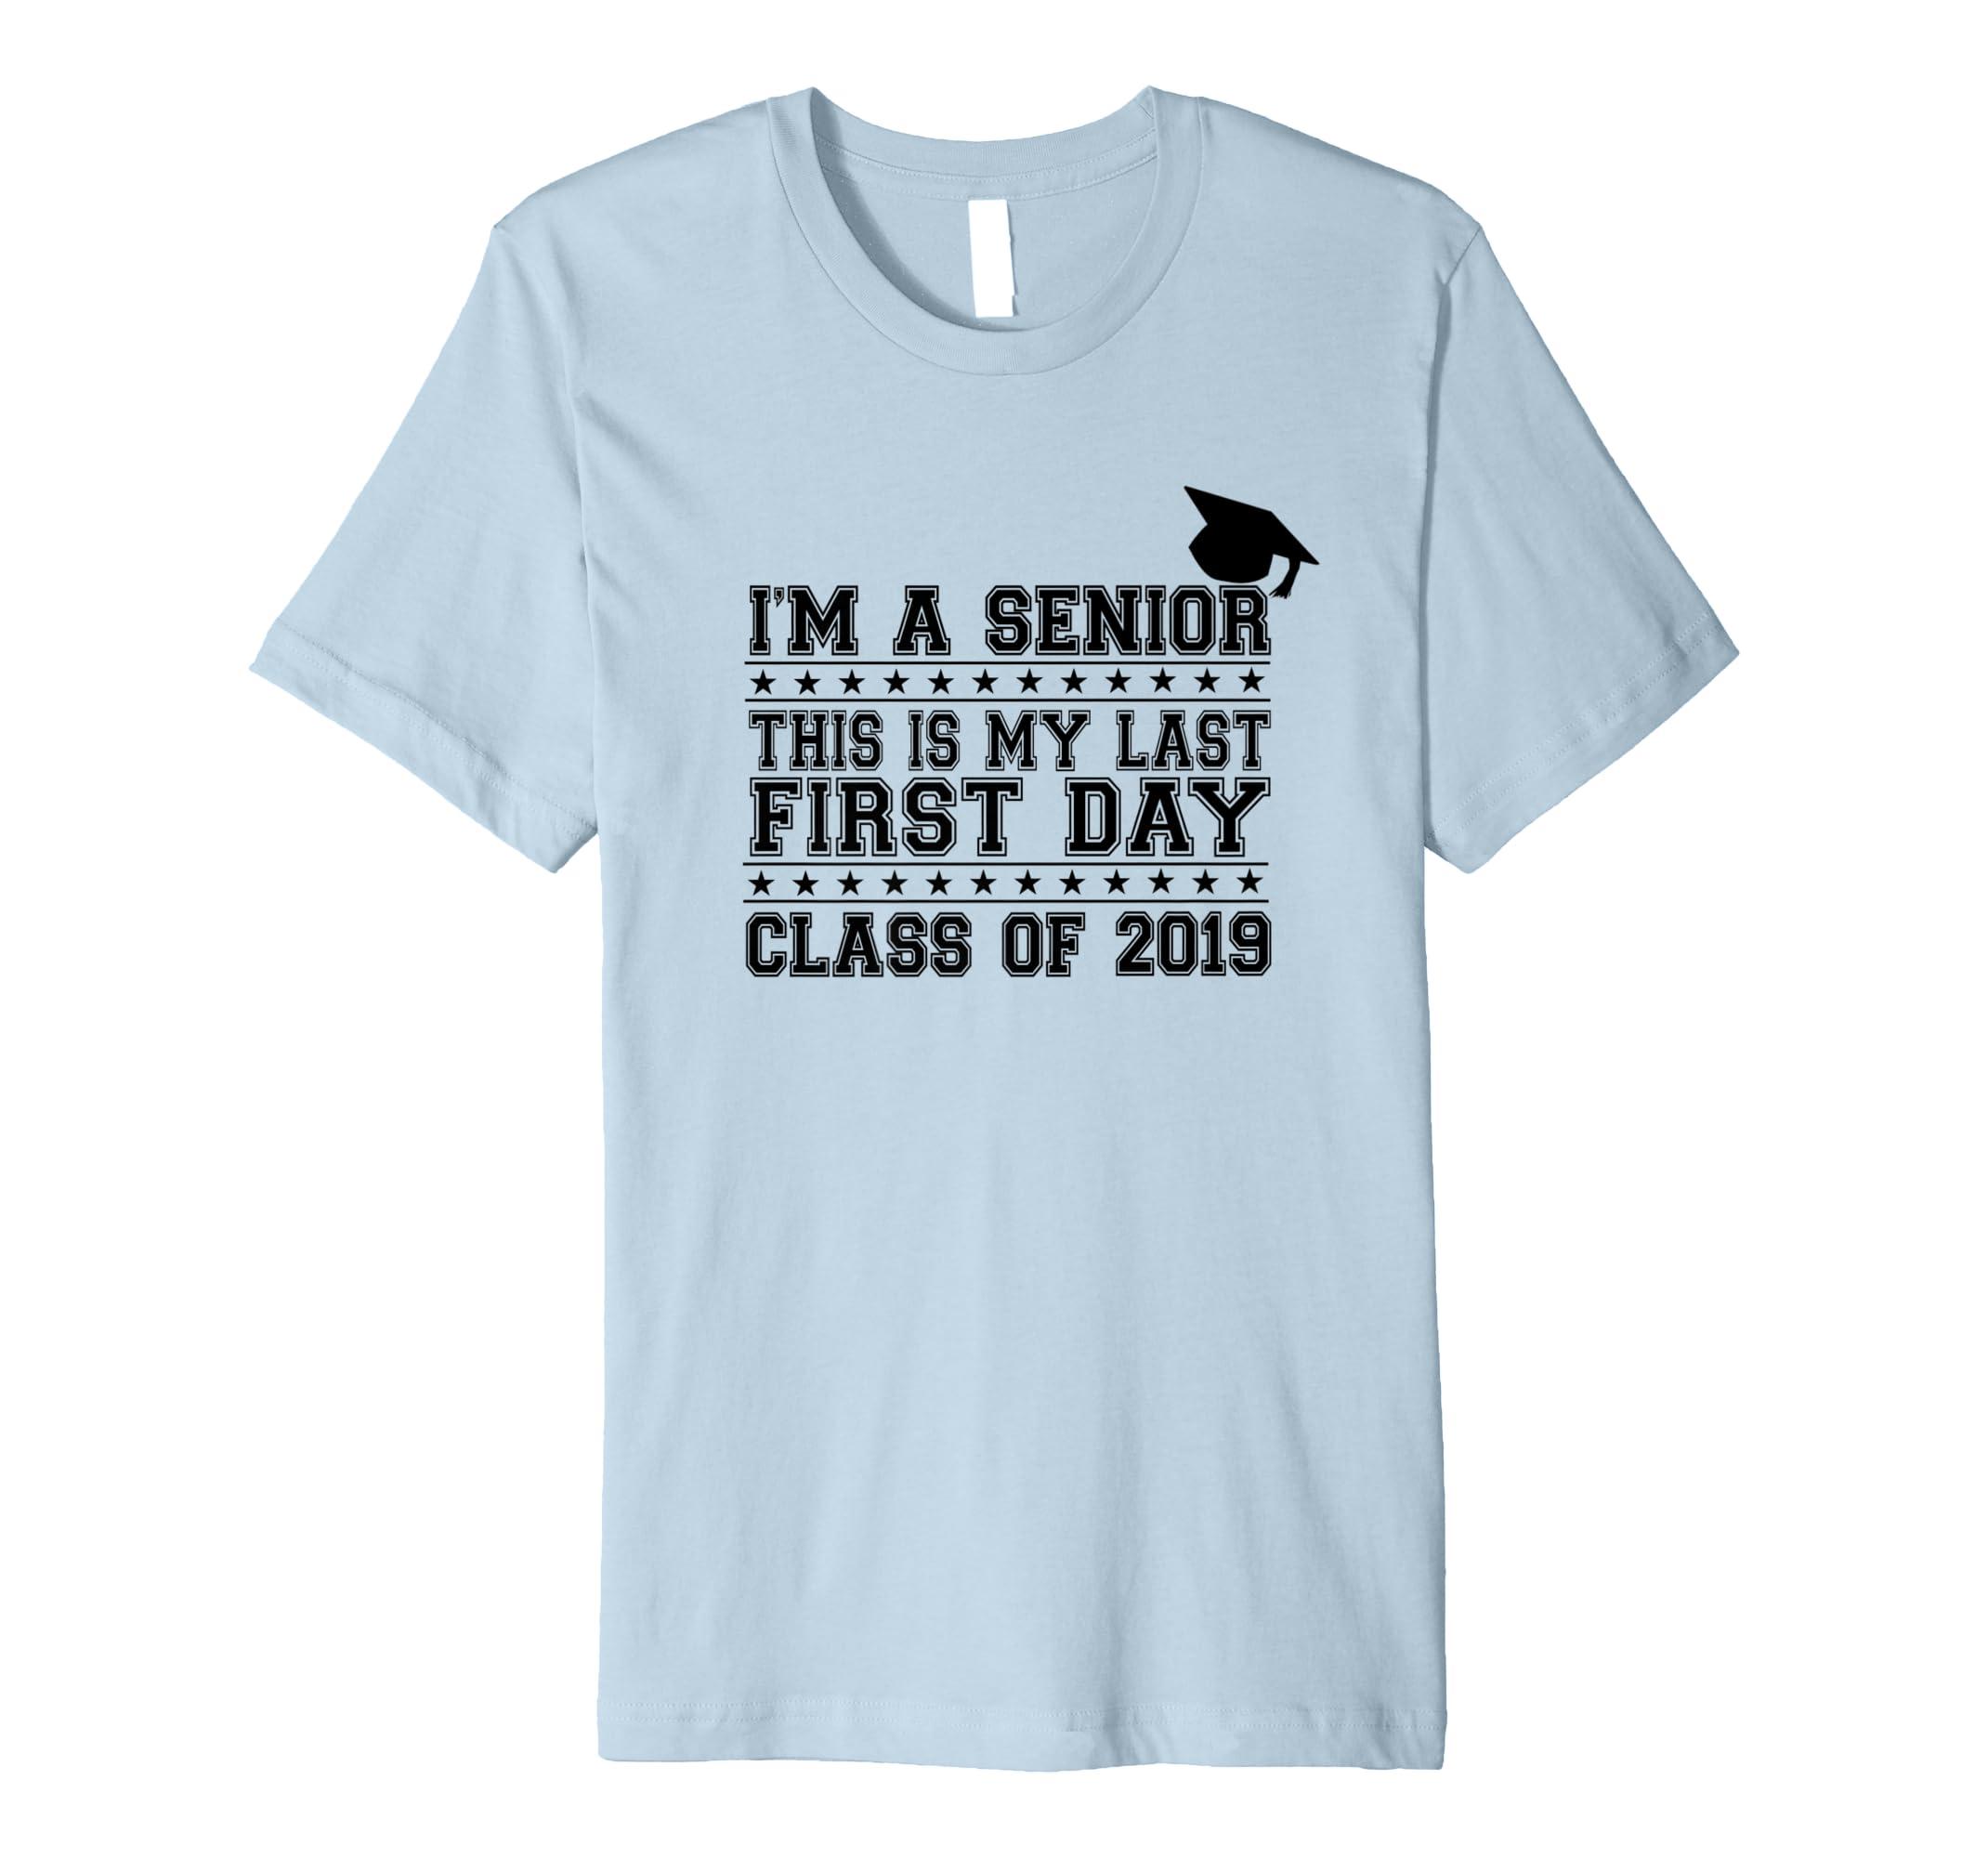 Amazon Com Back To School T Shirt Im A Senior Class Of 2019 Clothing